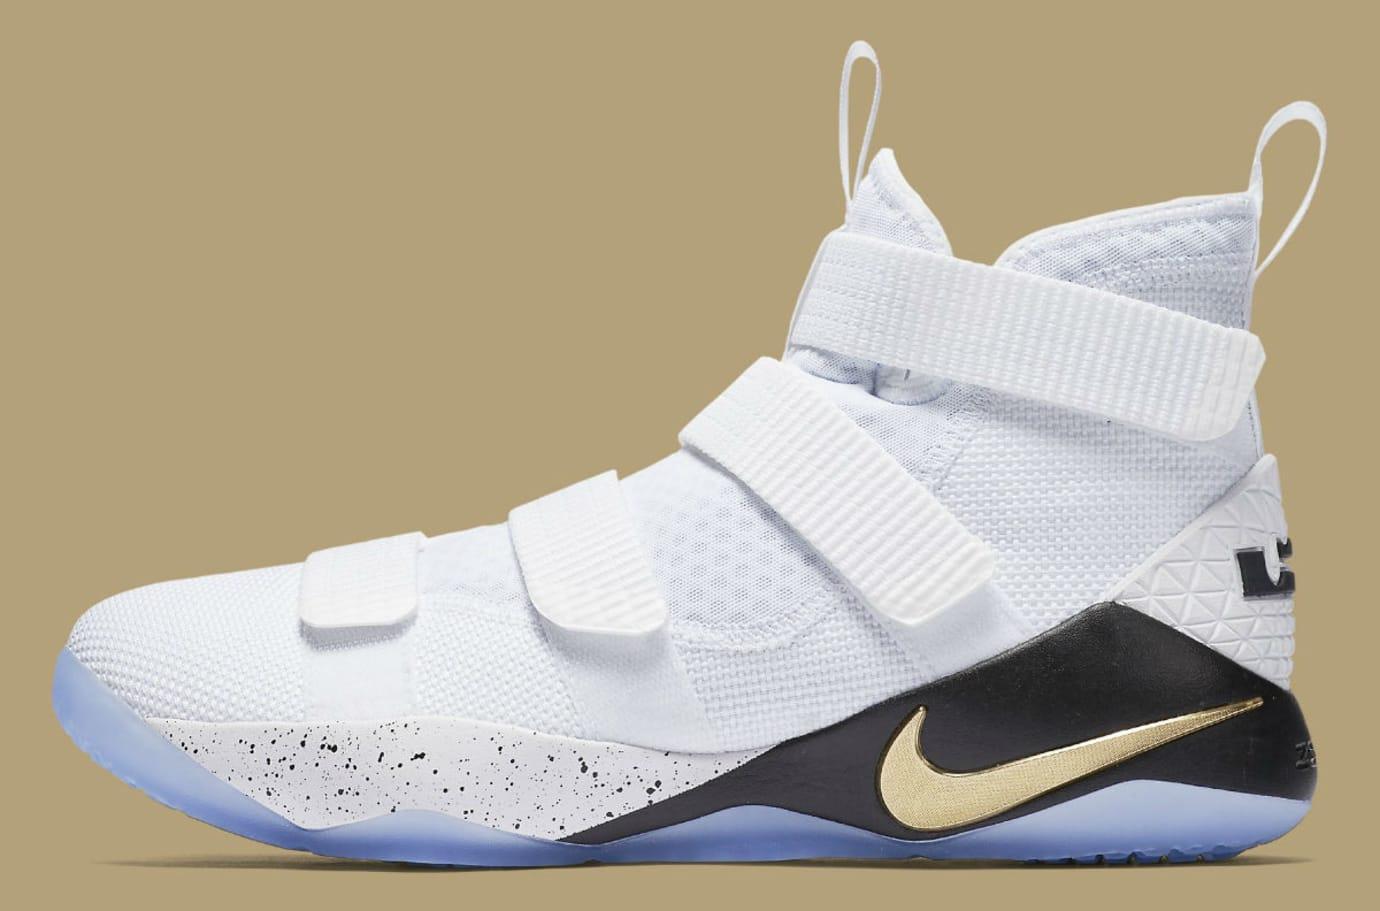 Nike LeBron Soldier 11 White Gold Black Release Date Profile 897644-101